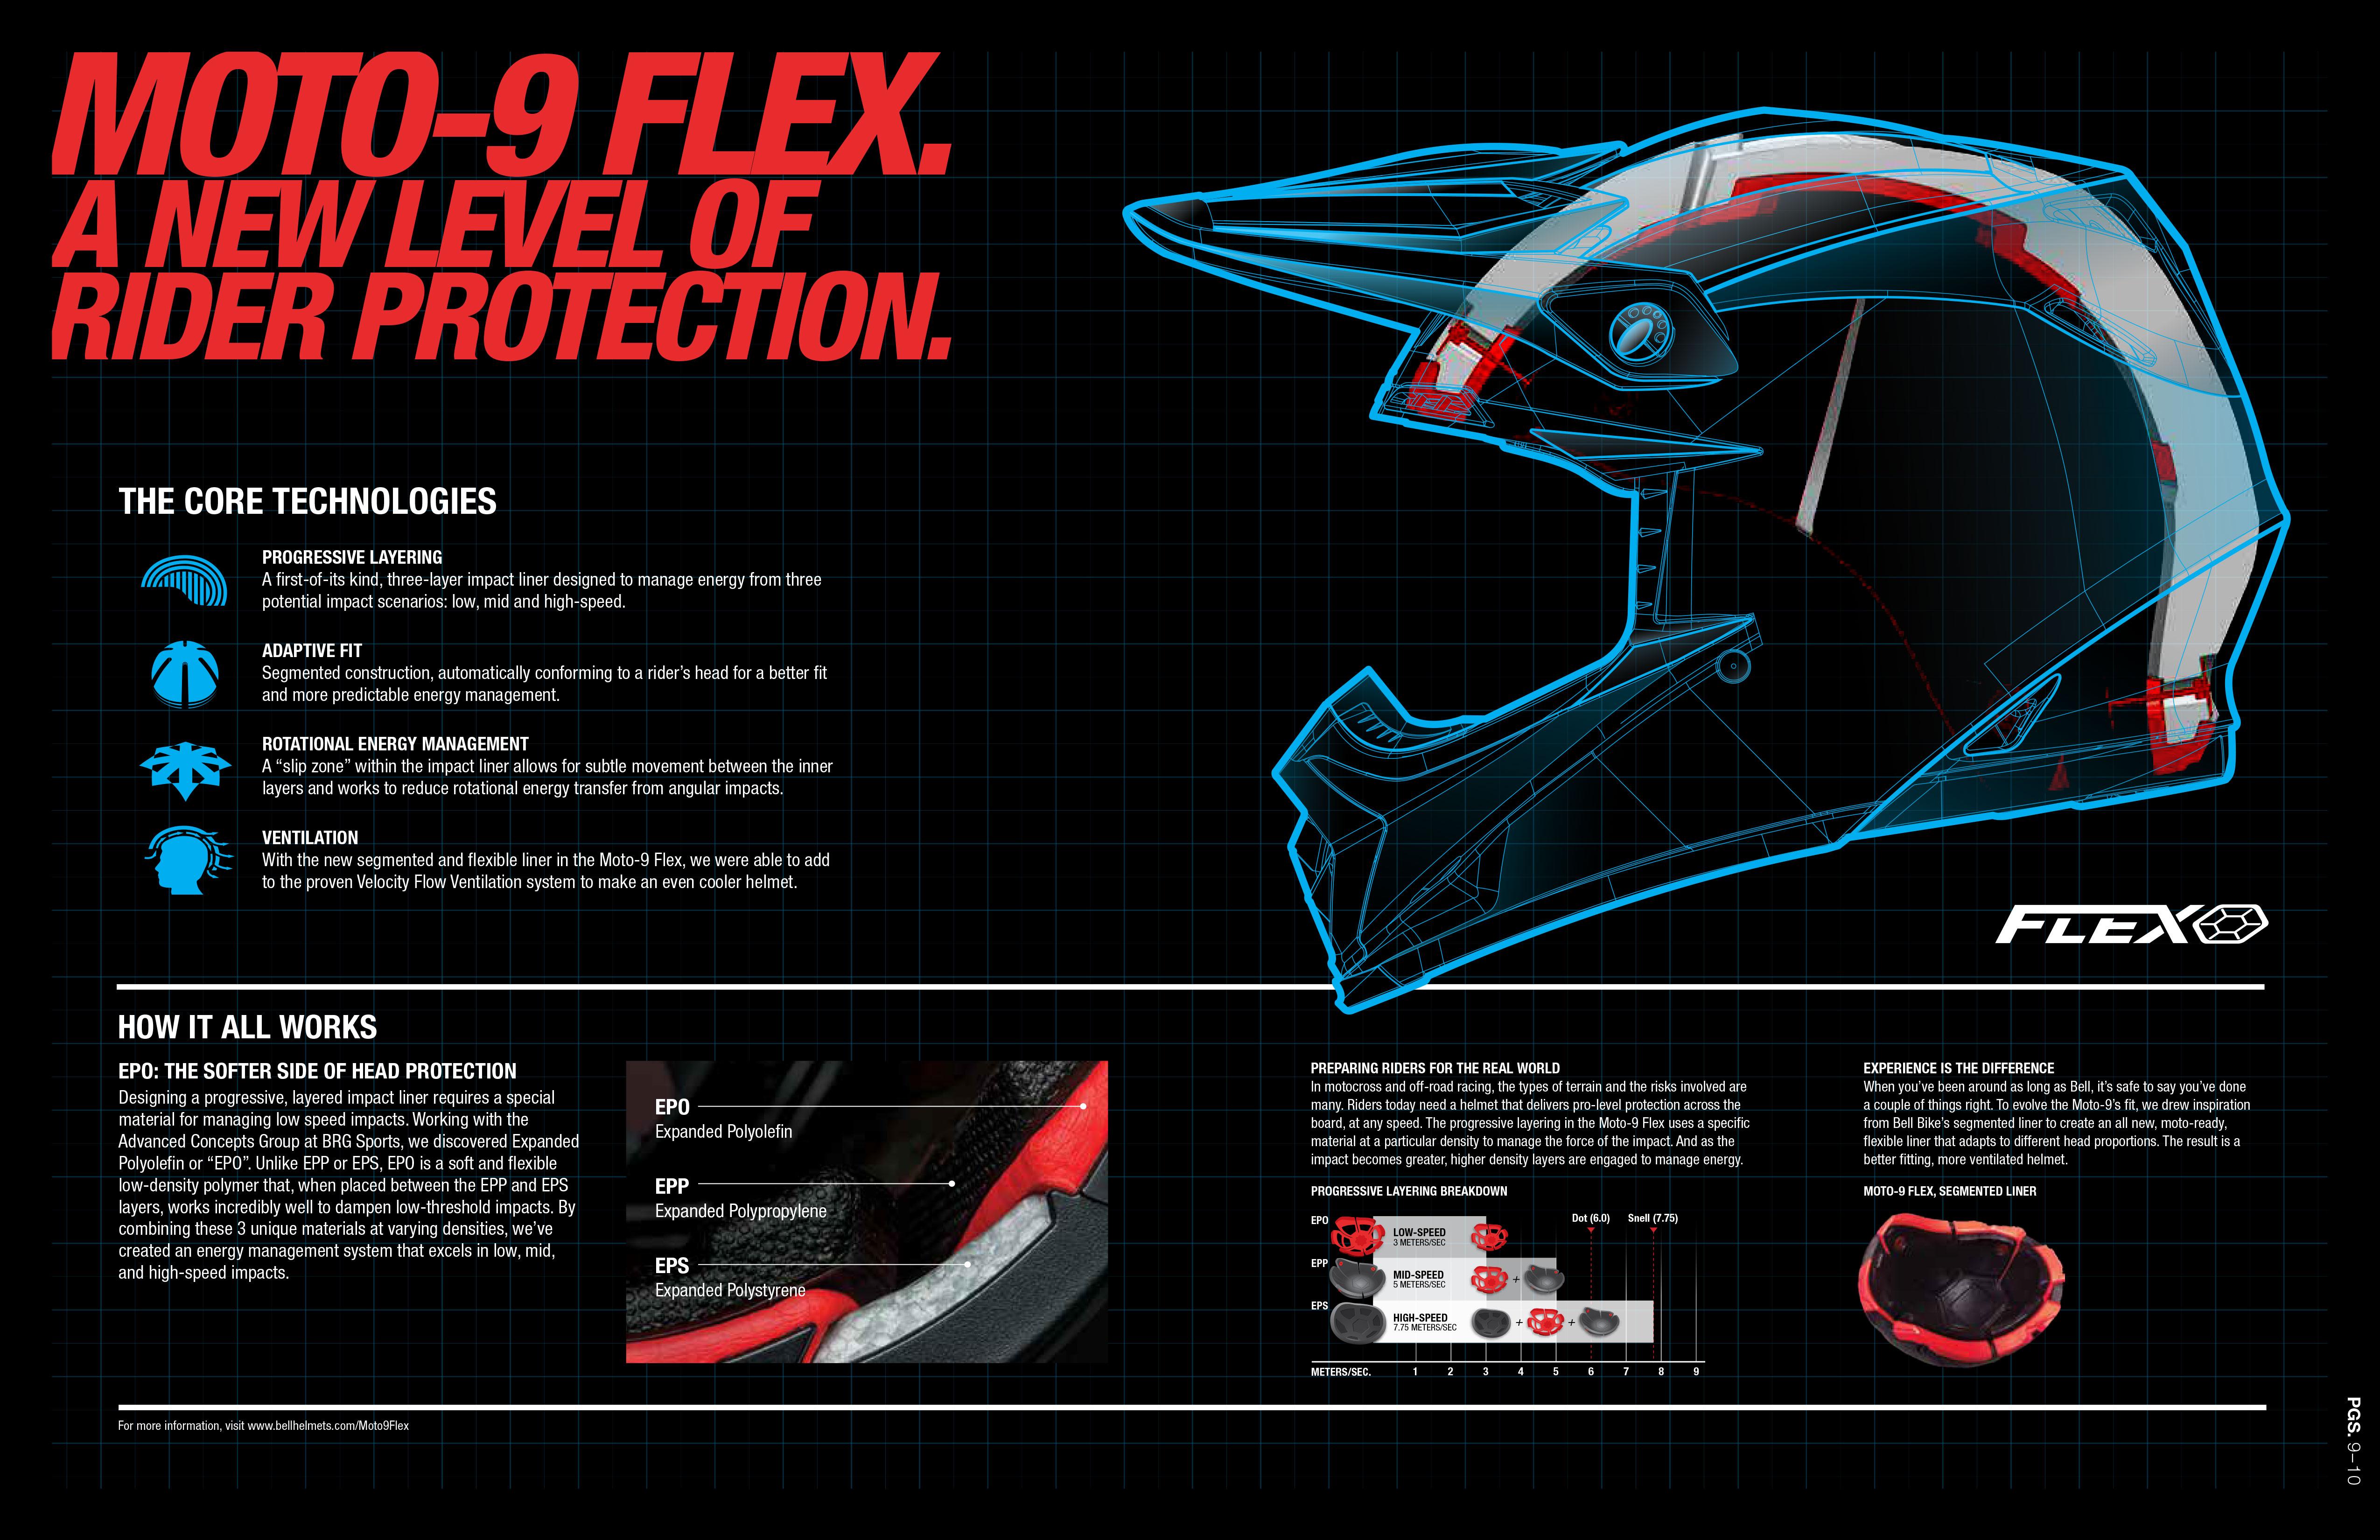 moto-9-flex-information.jpg